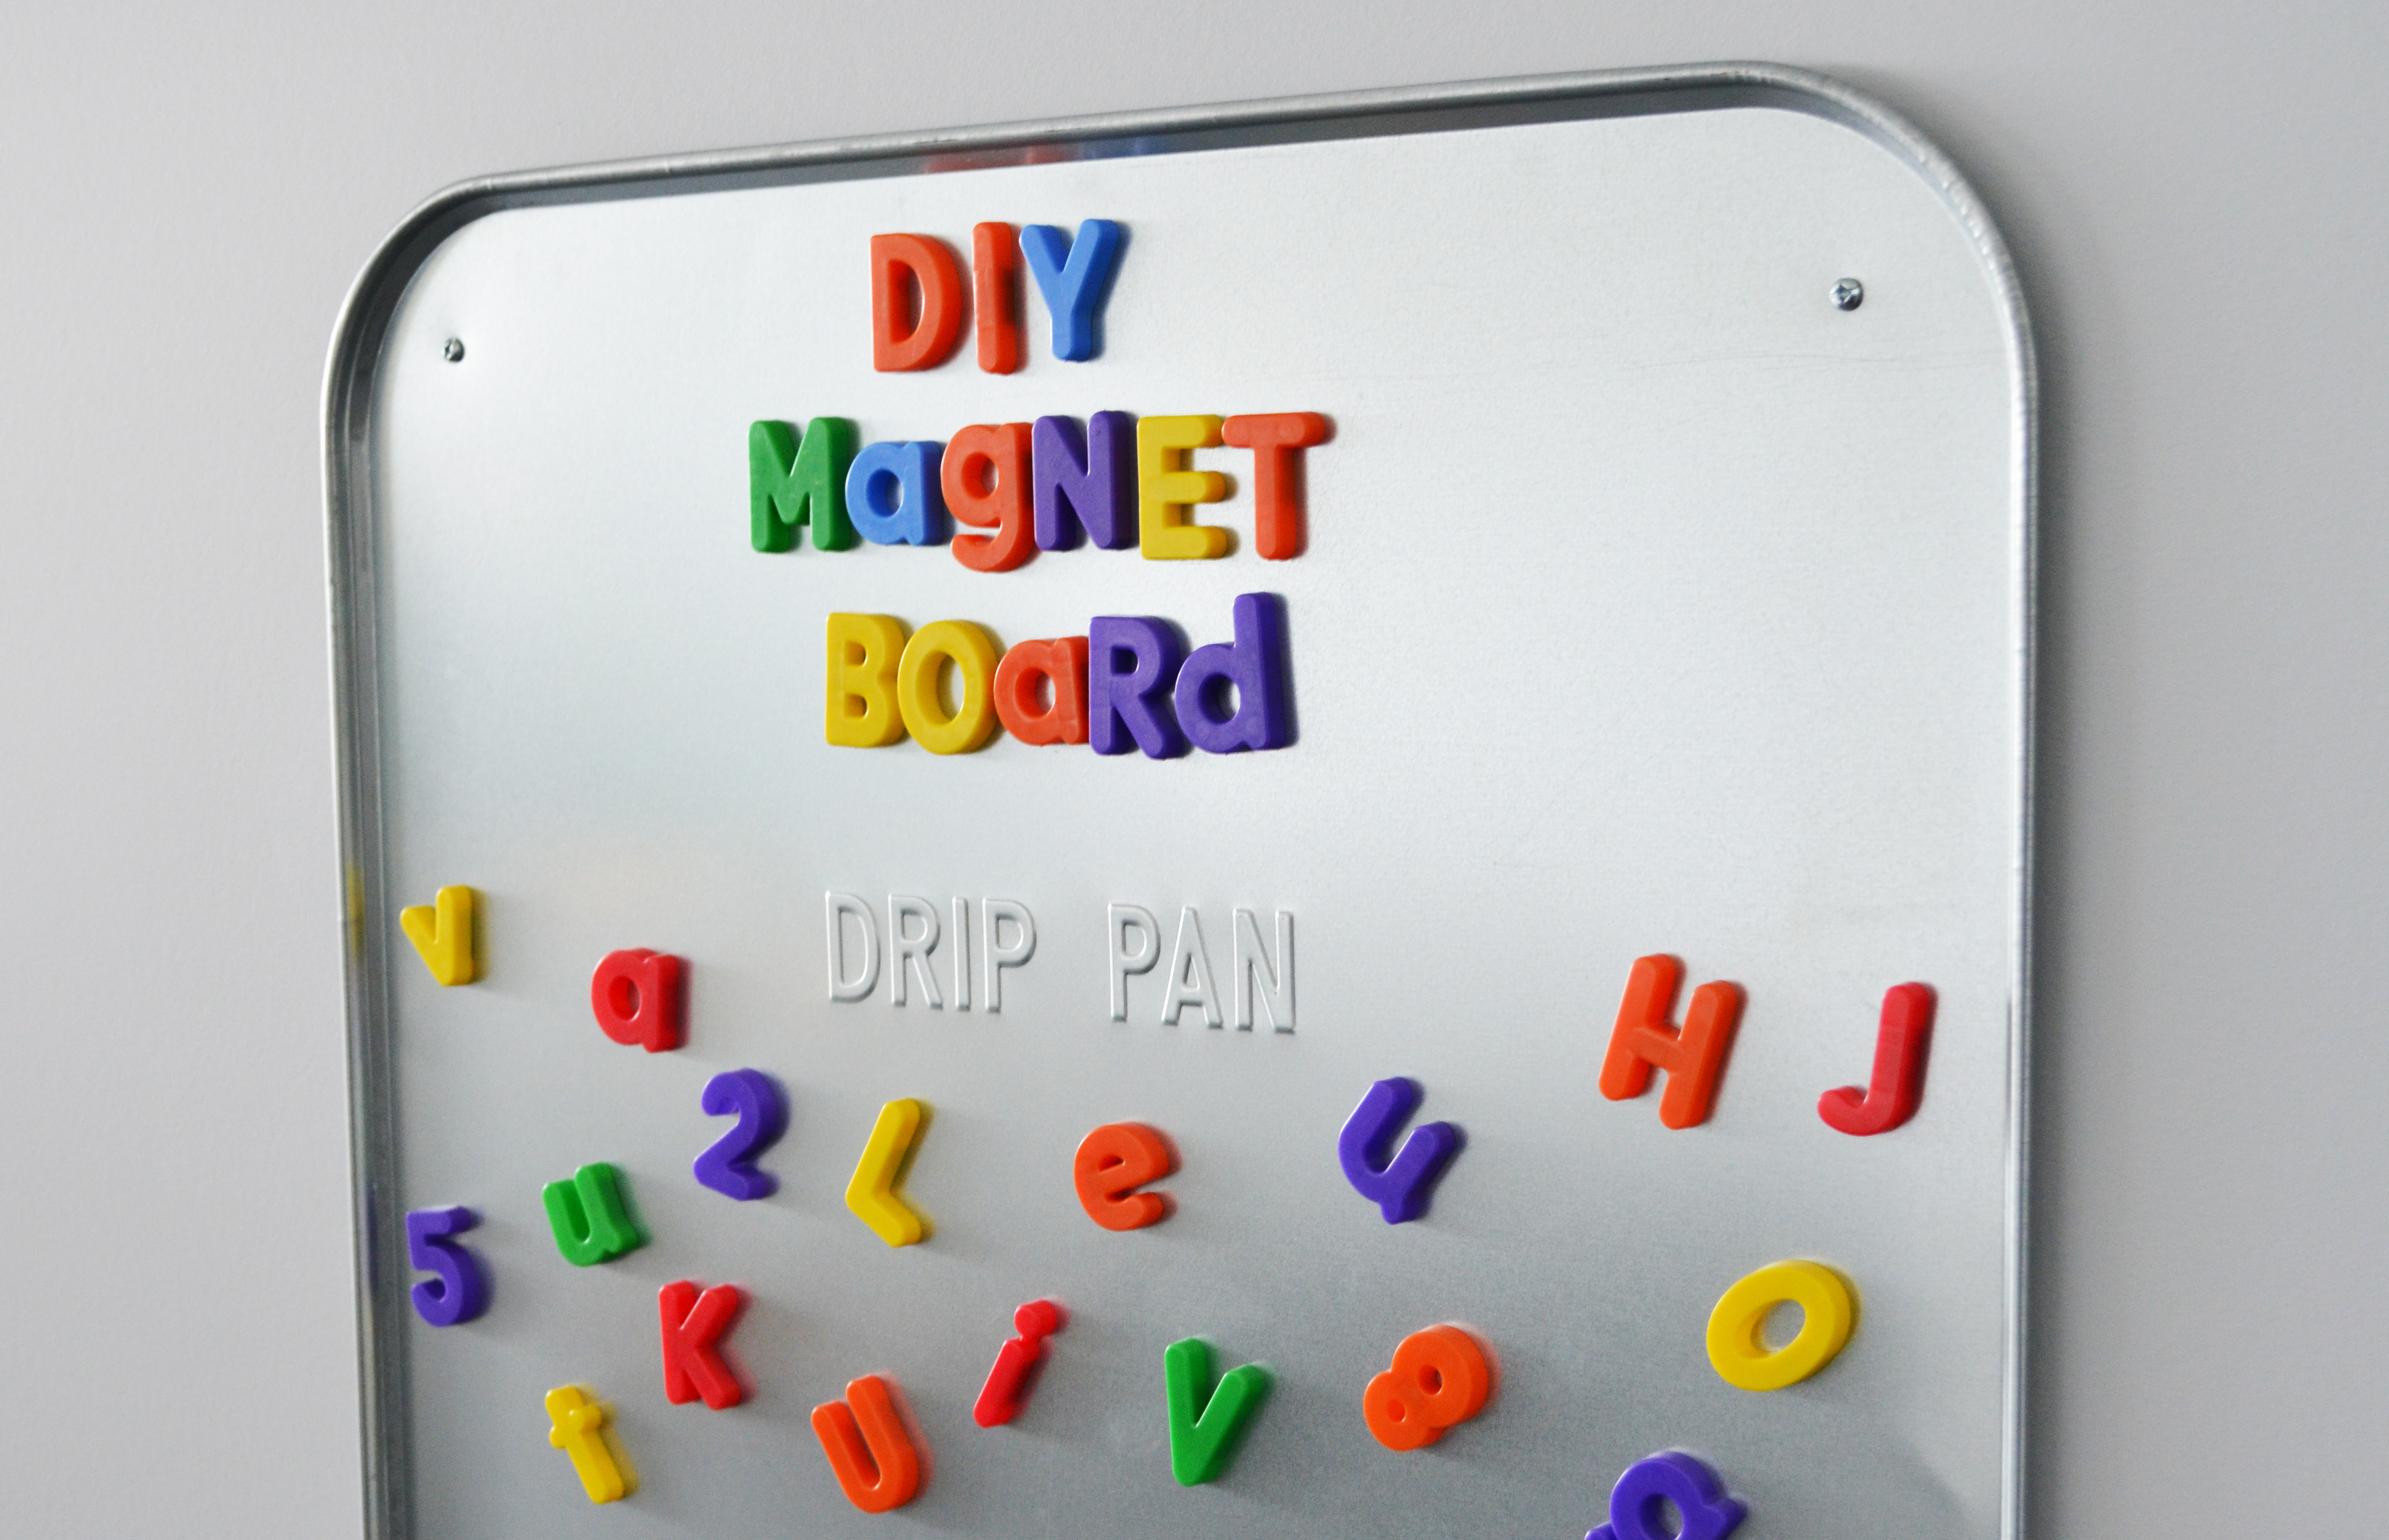 Diy Magnet Board Whisking Mama